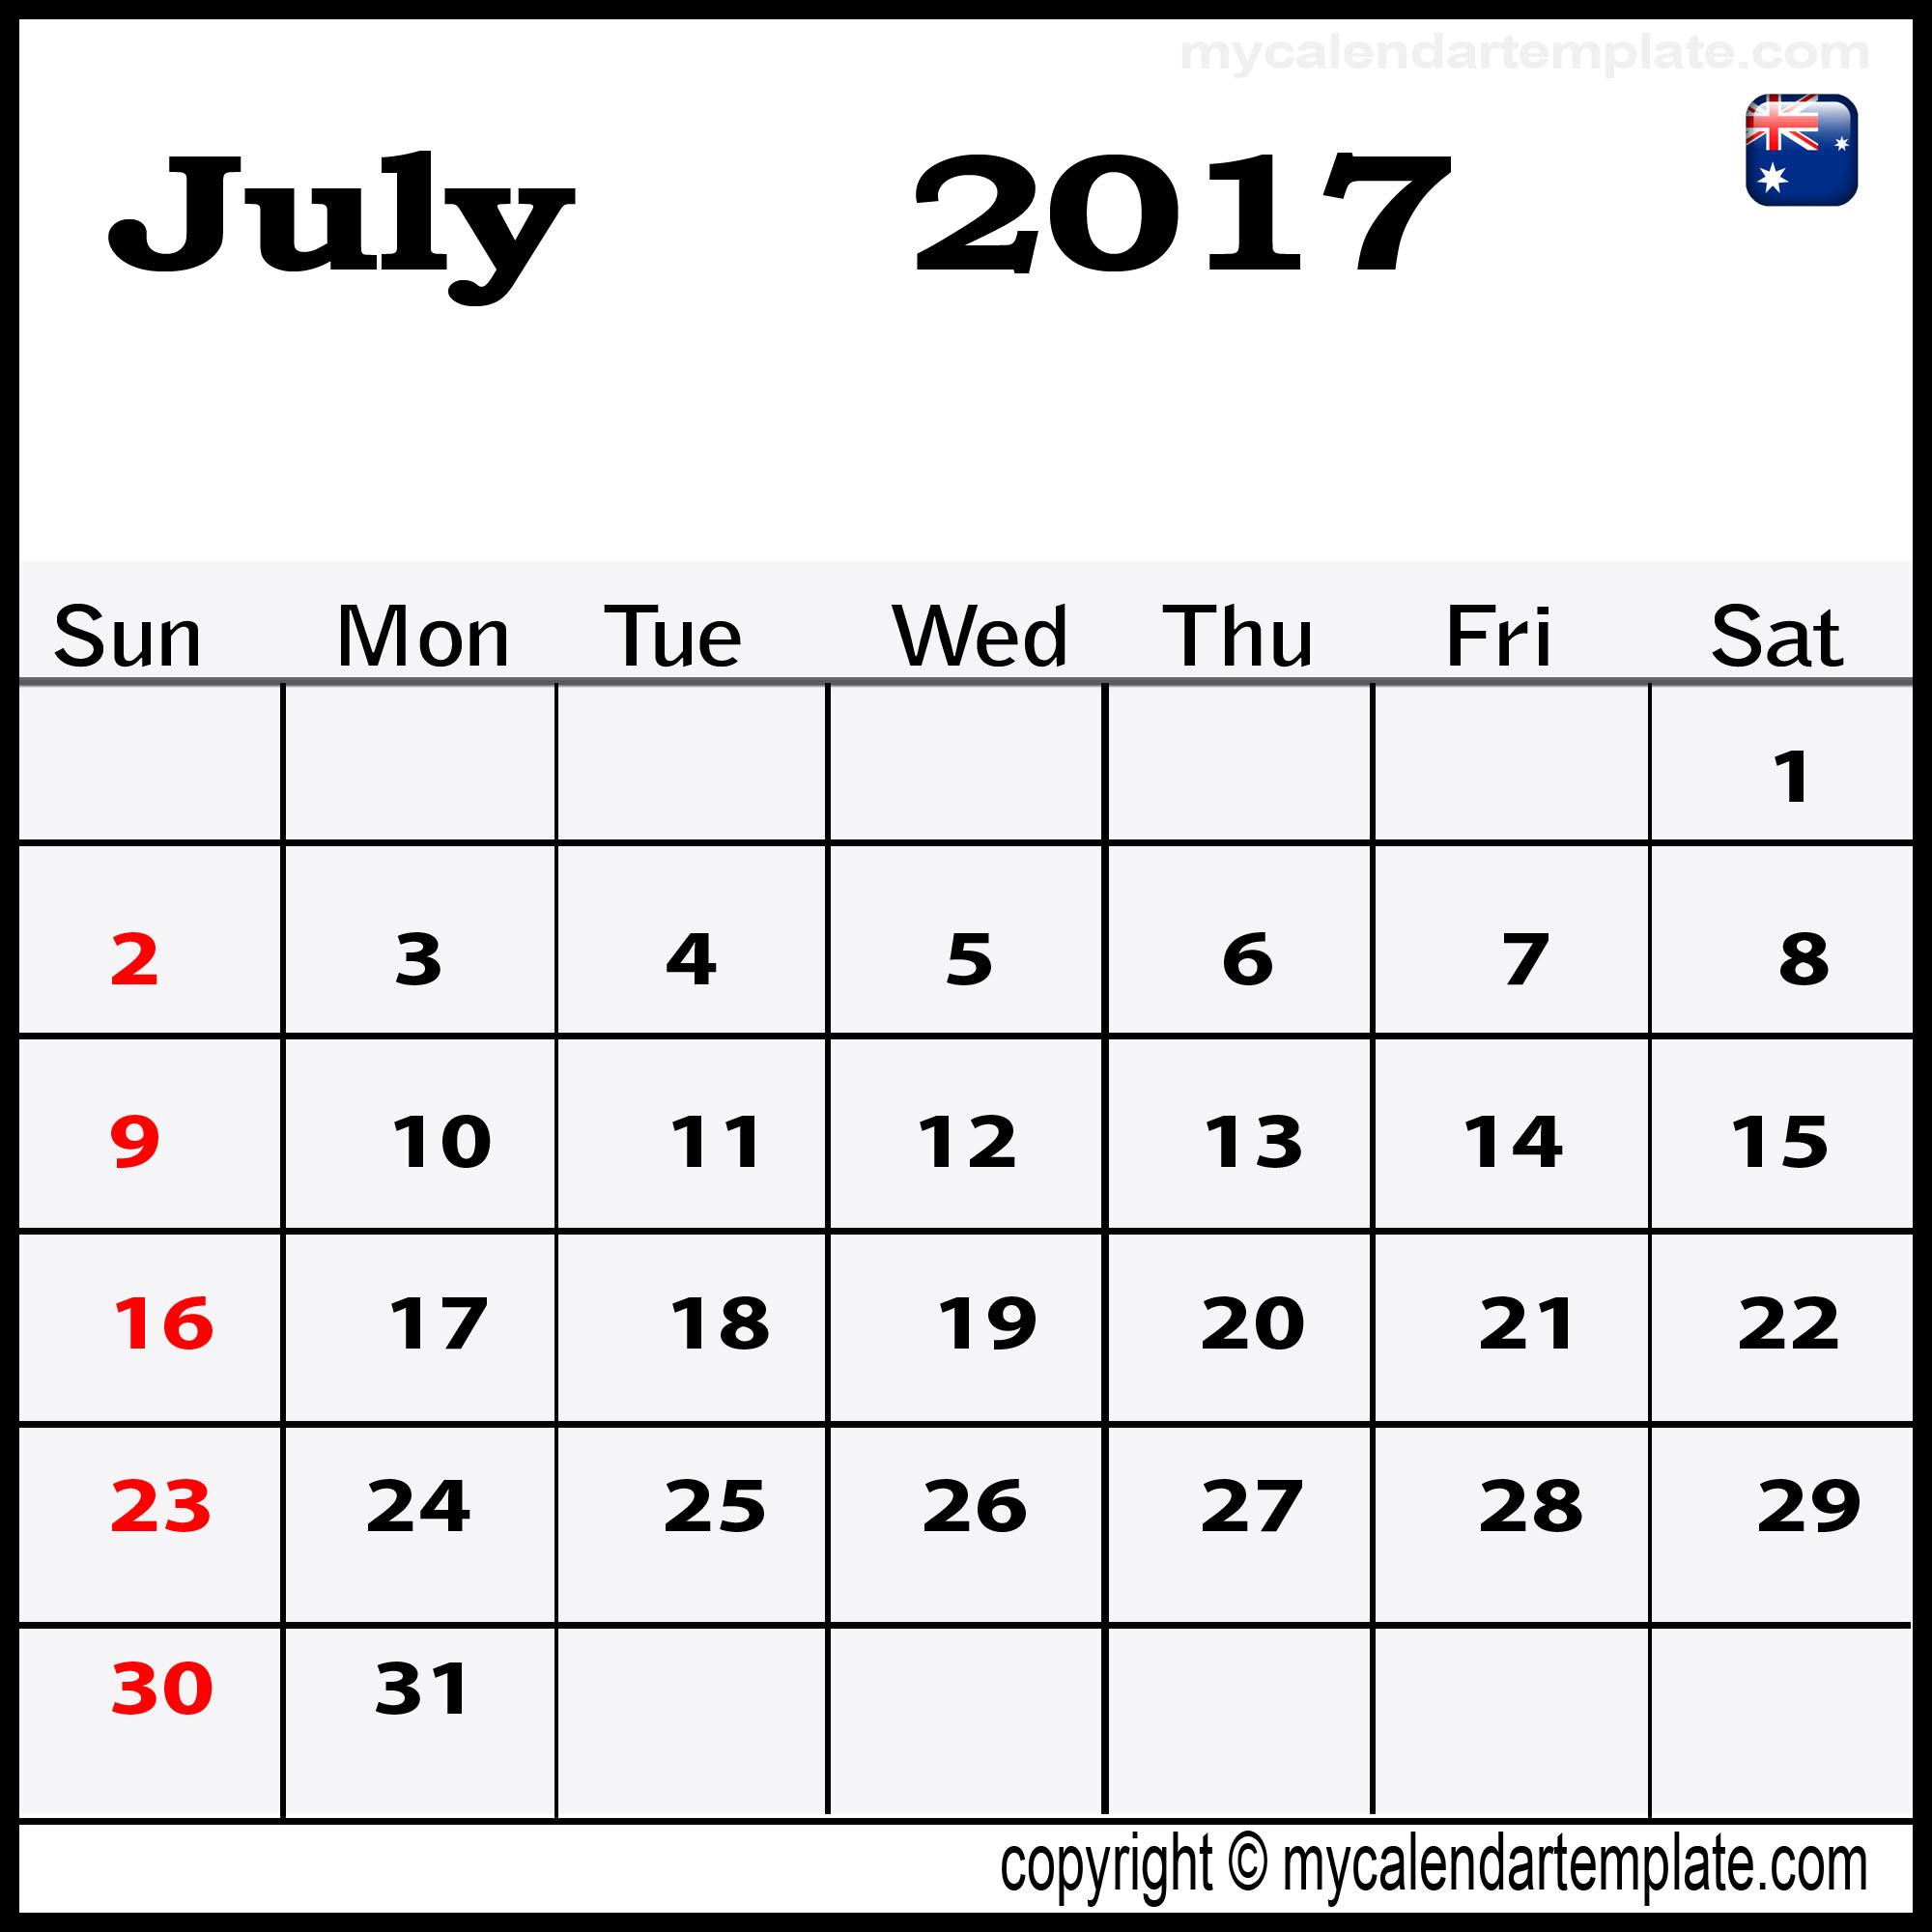 july 2017 calendar australia